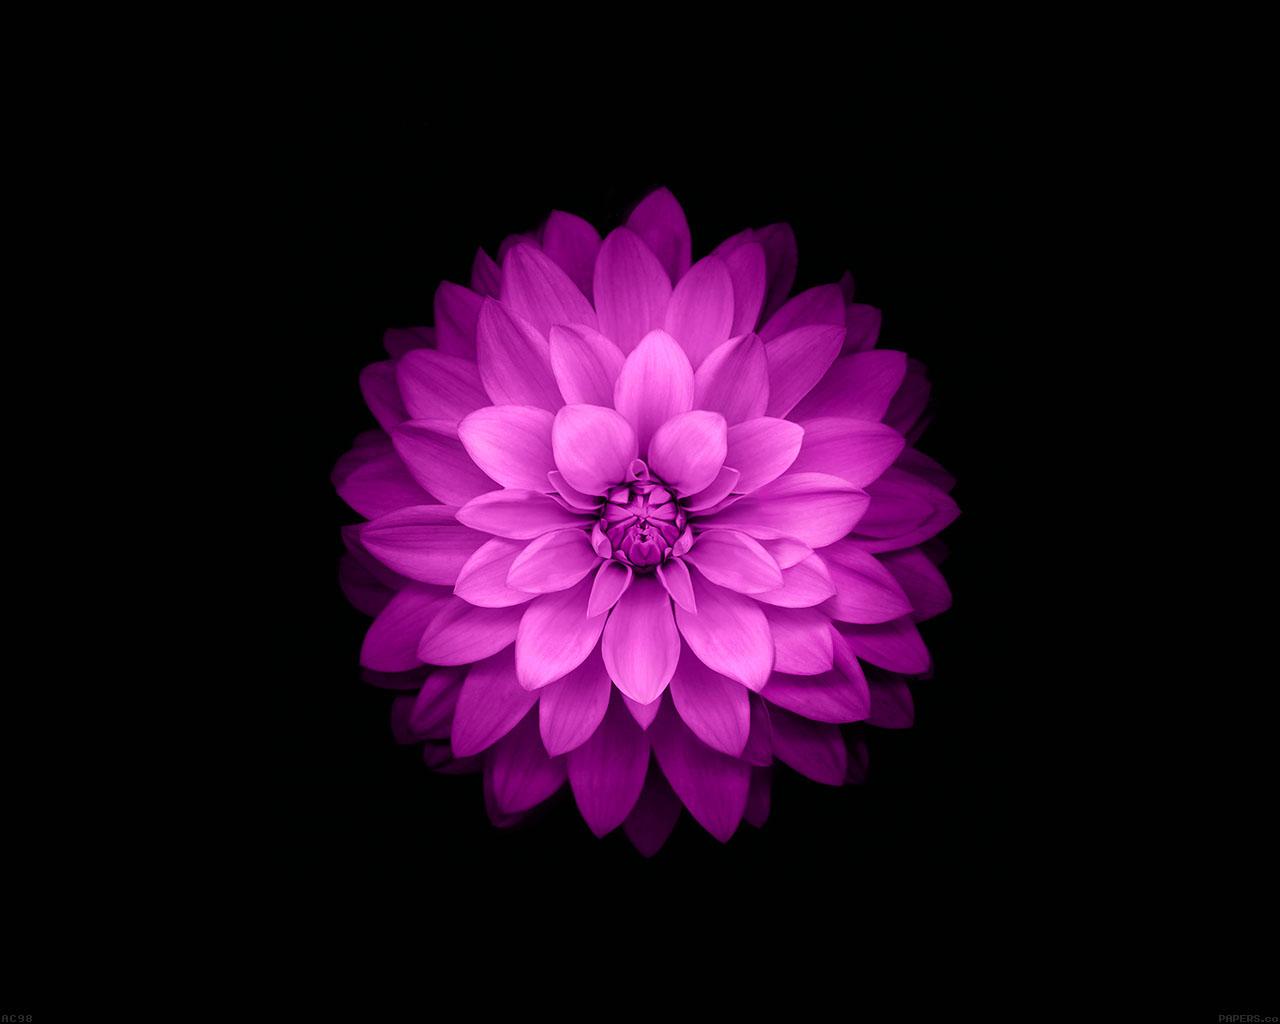 ac98-wallpaper-apple-red-lotus-iphone6-plus-ios8-flower-wallpaper